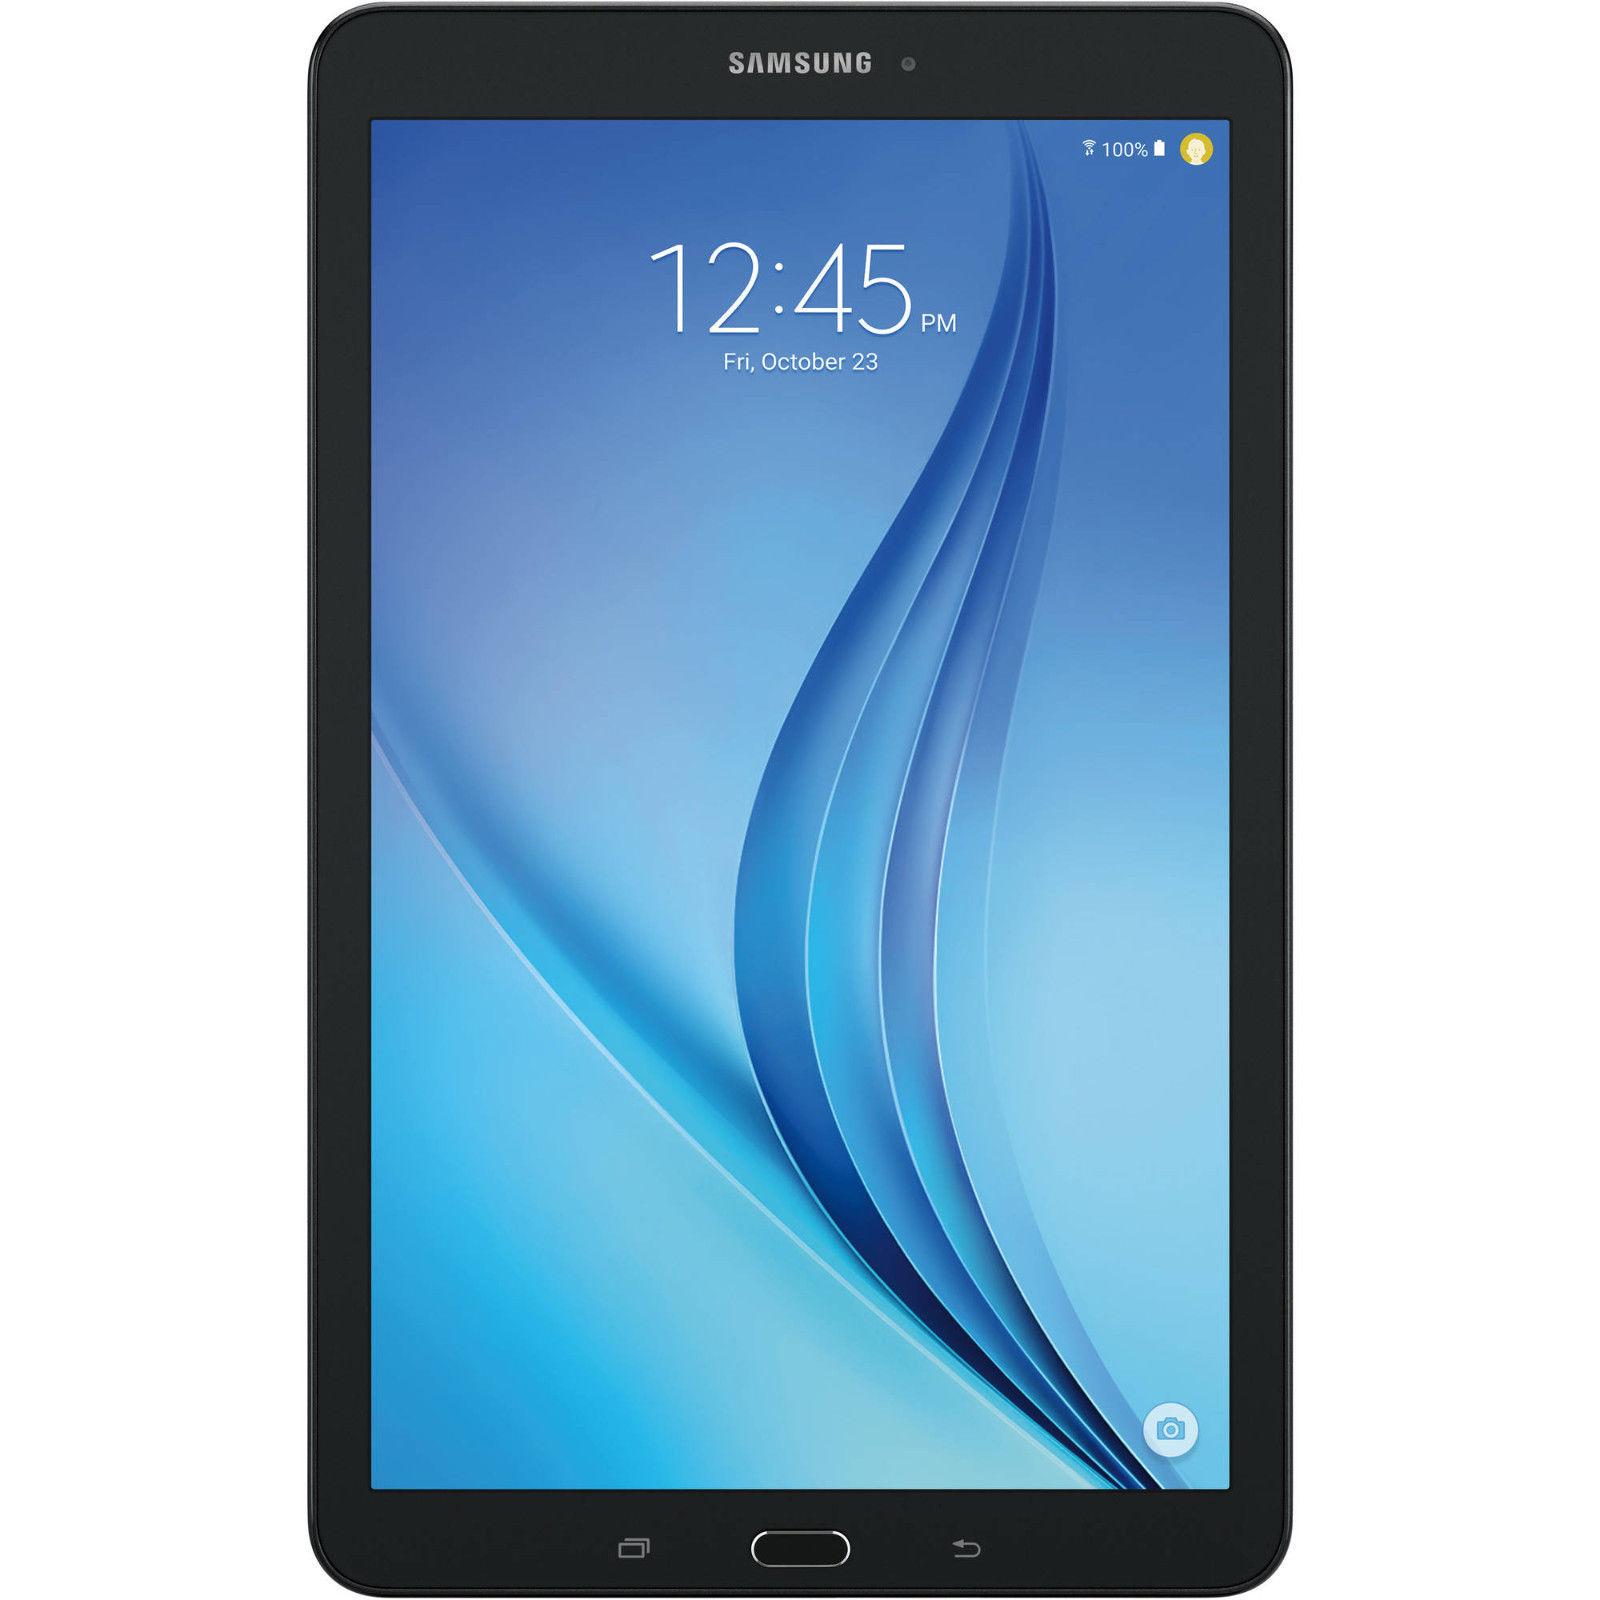 "Samsung Galaxy Tab E 8"" HD Display 4G LTE 16GB GSM Unlocked T377A $109 at eBay"